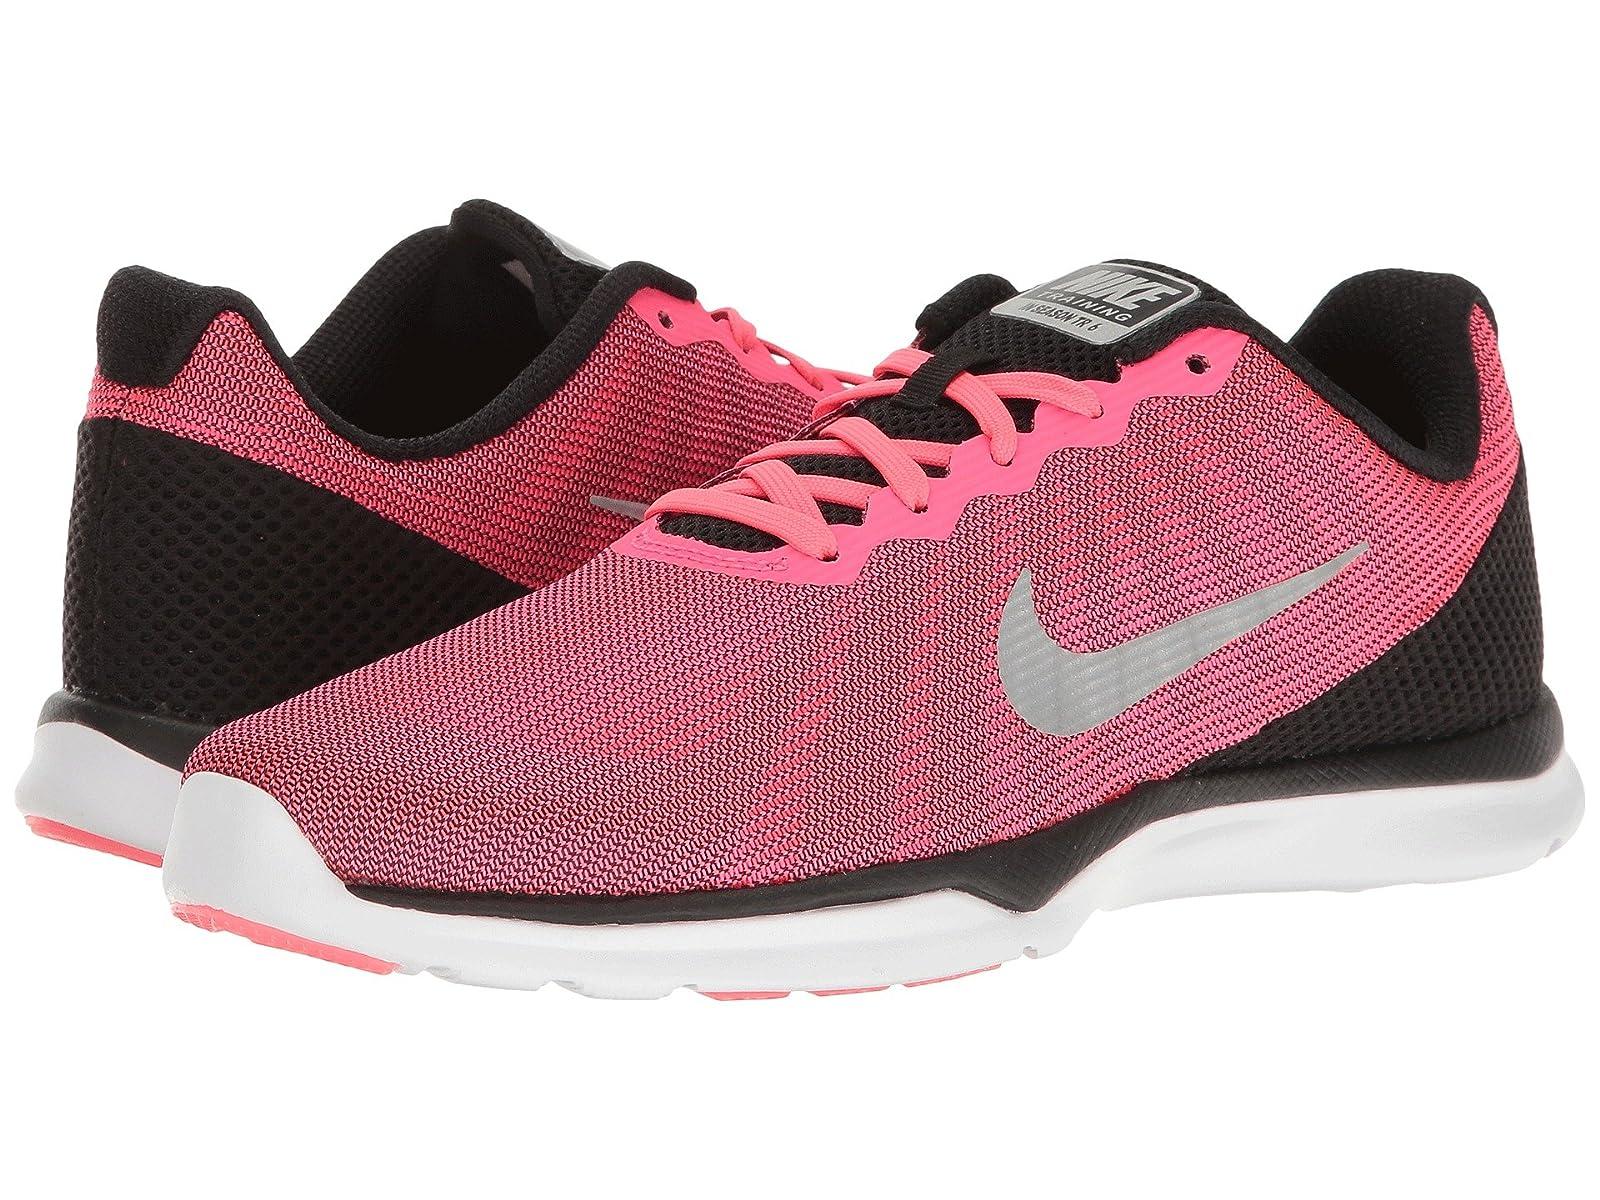 Nike In-Season TR 6 PrintCheap and distinctive eye-catching shoes